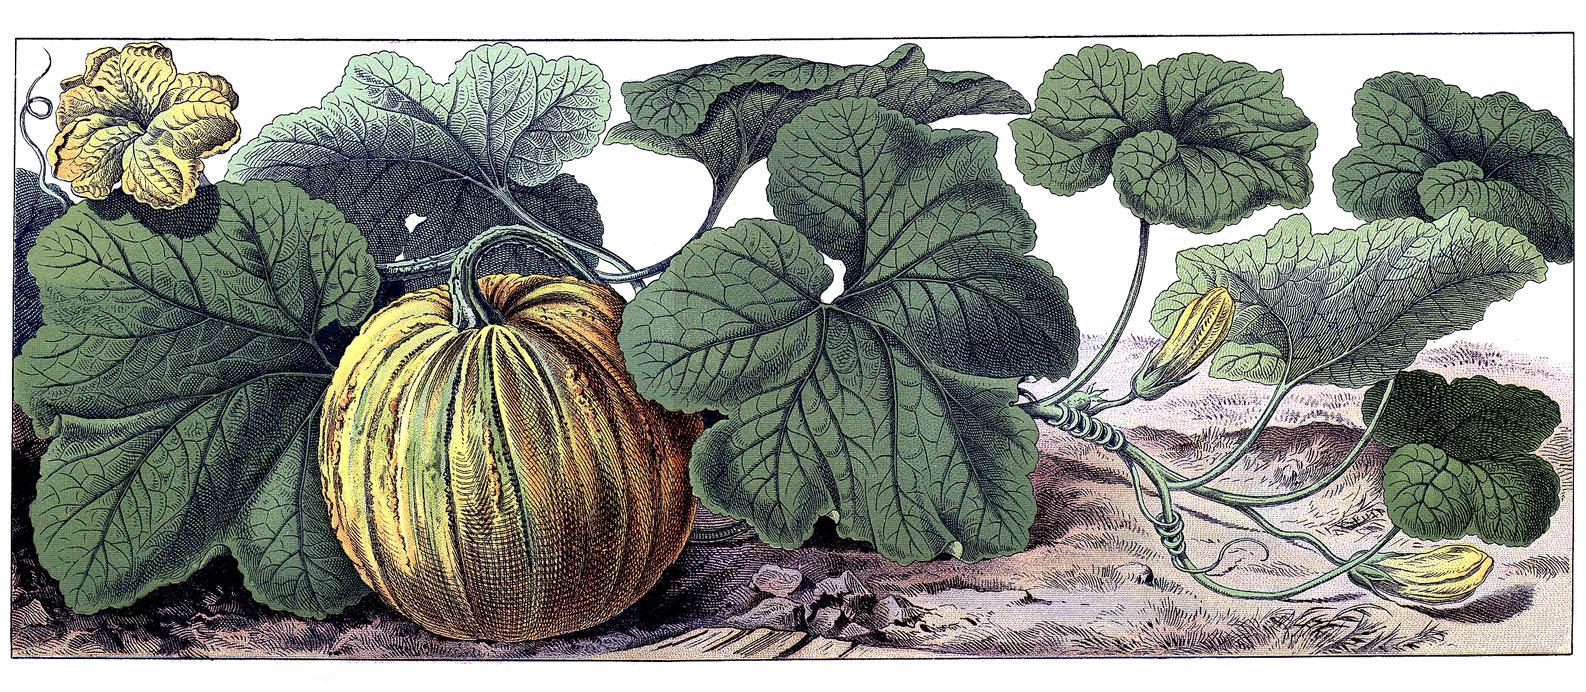 https://thegraphicsfairy.com/wp-content/uploads/blogger/-CHV6sYnZuhg/TpYgRod9PqI/AAAAAAAAOXo/d8oUe5yikFQ/s1600/pumpkin+botanical+vintage+graphicsfairysm.jpg